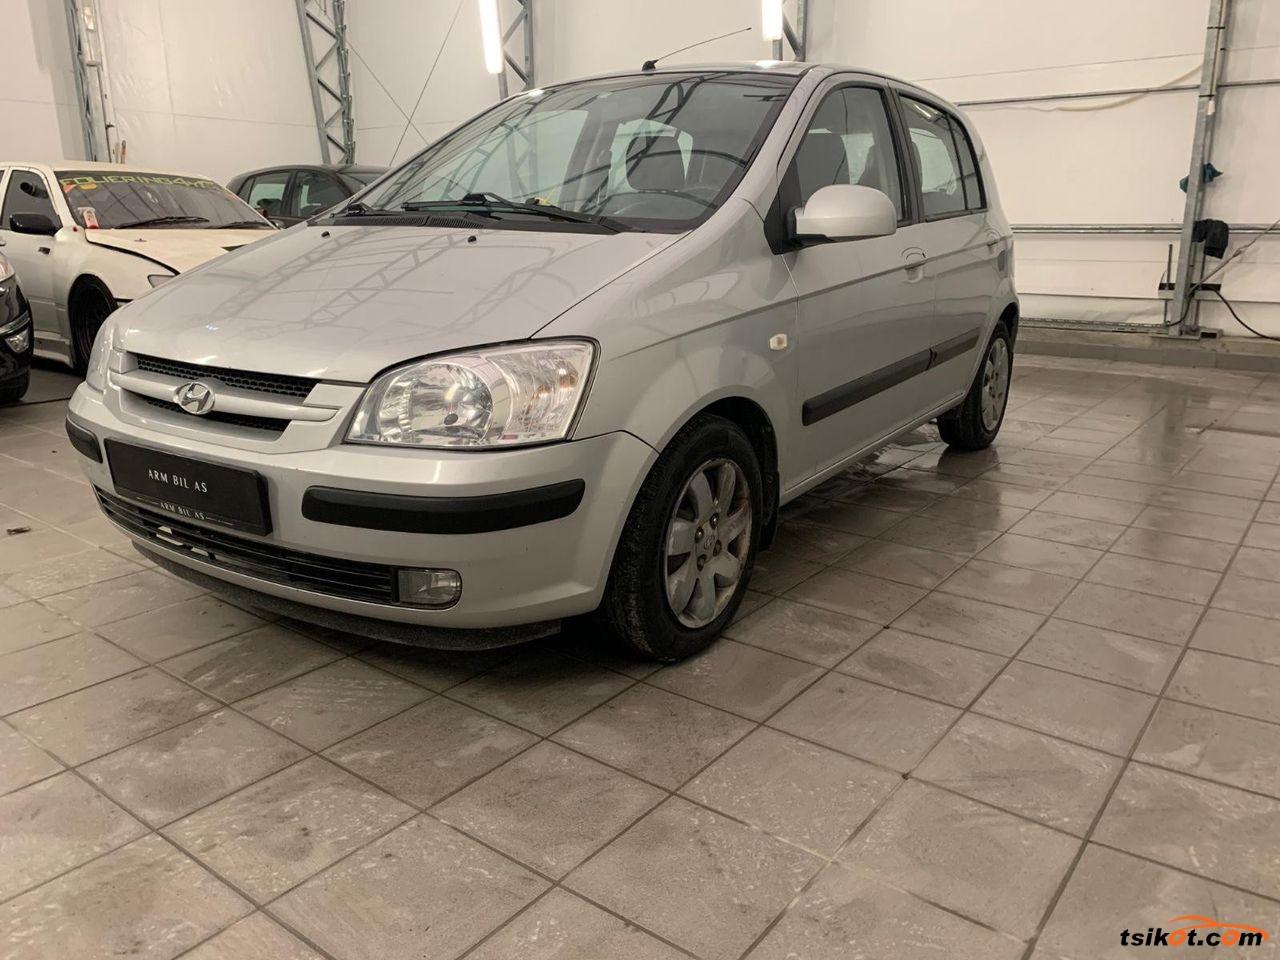 Hyundai Getz 2005 - 3